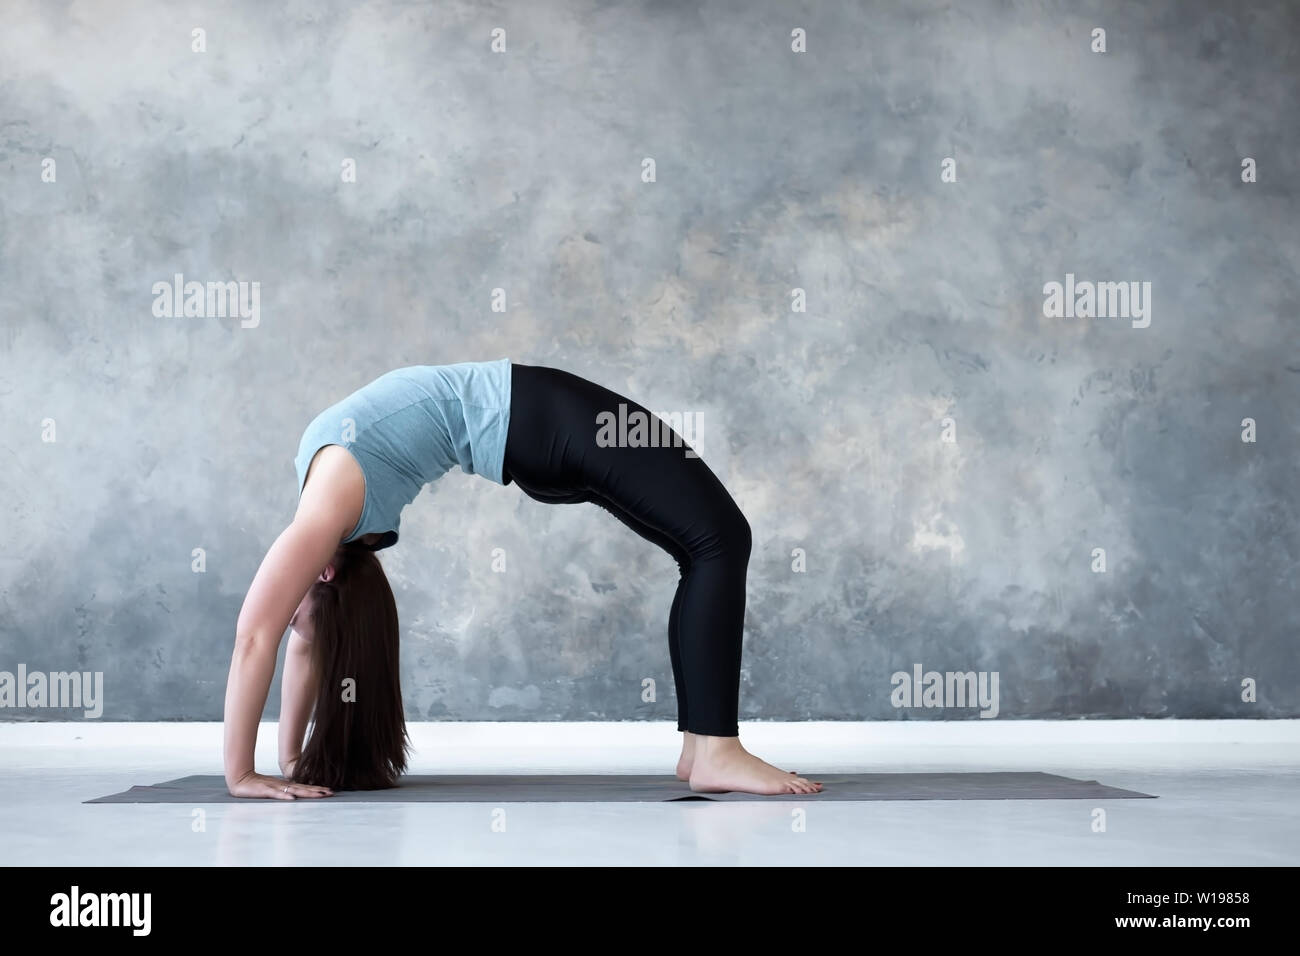 Woman practicing yoga, standing in Urdhva Dhanurasana pose - Stock Image